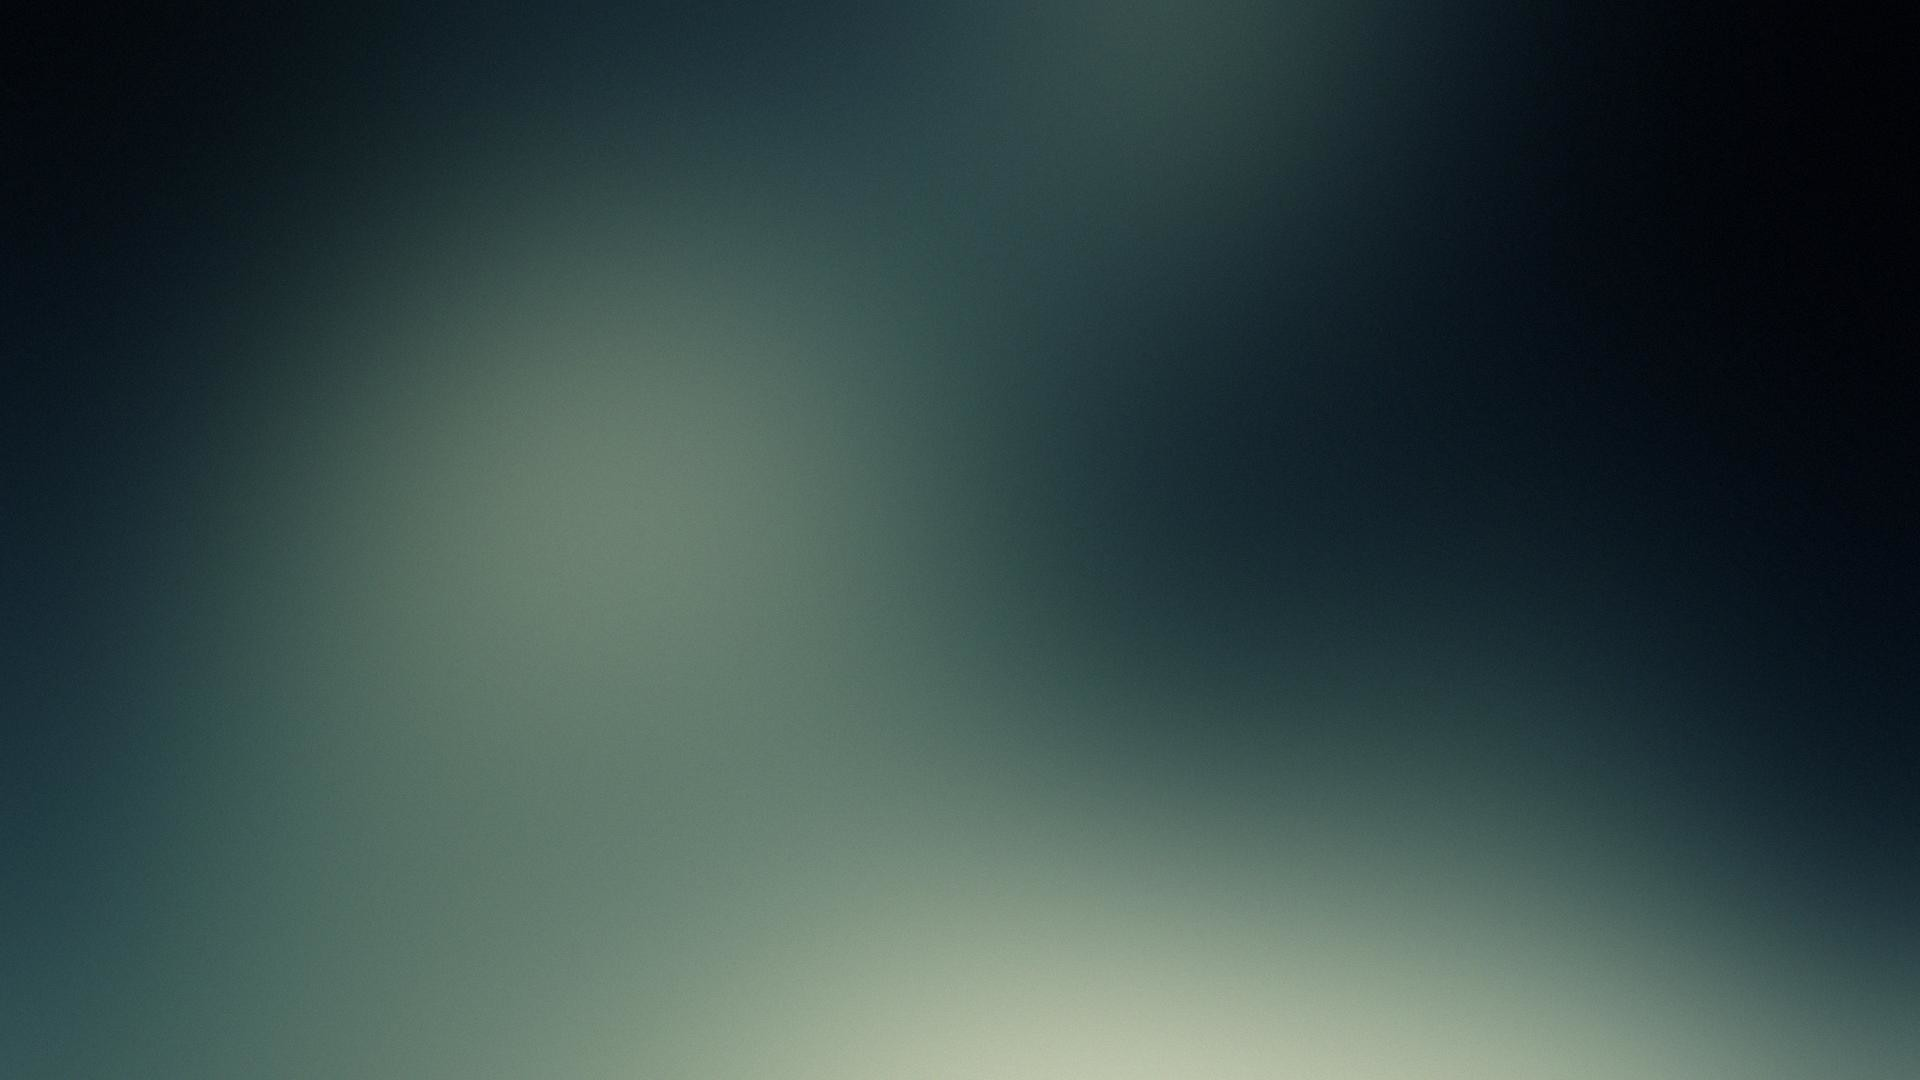 color gradient wallpaper hd (73+ images)